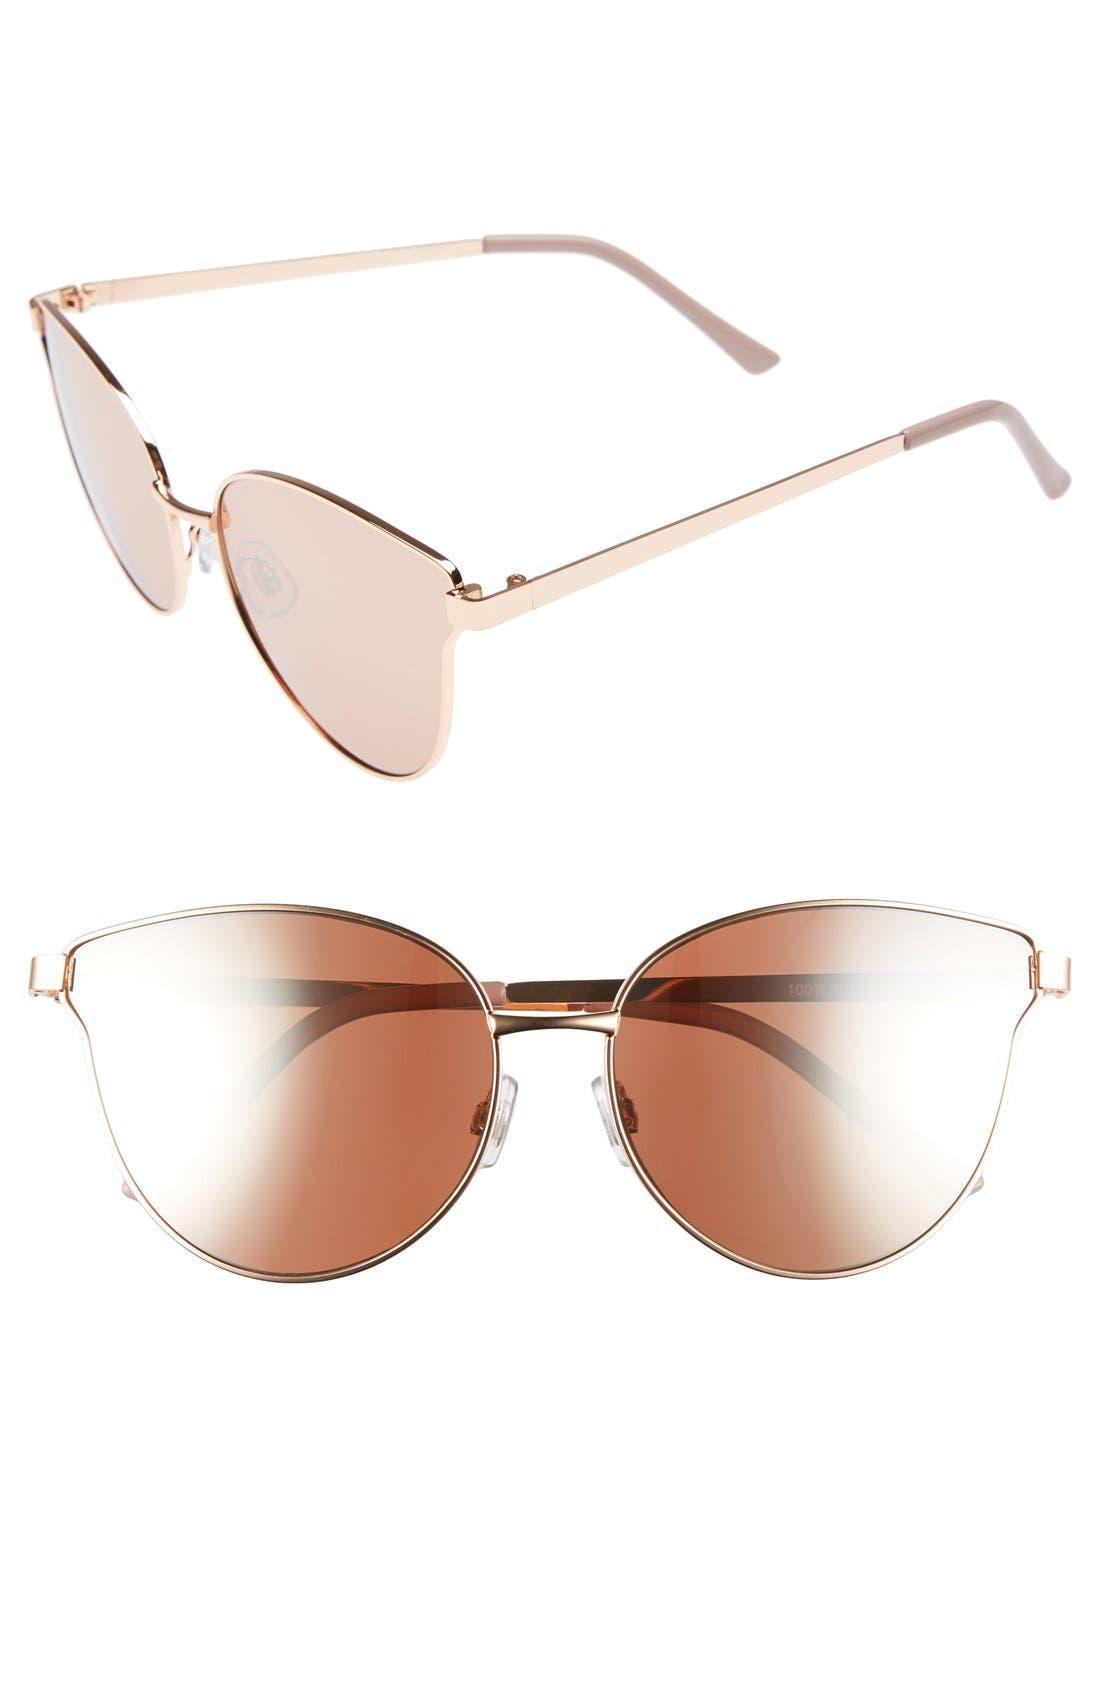 Alternate Image 1 Selected - BP. 57mm Mirrored Metal Cat Eye Sunglasses